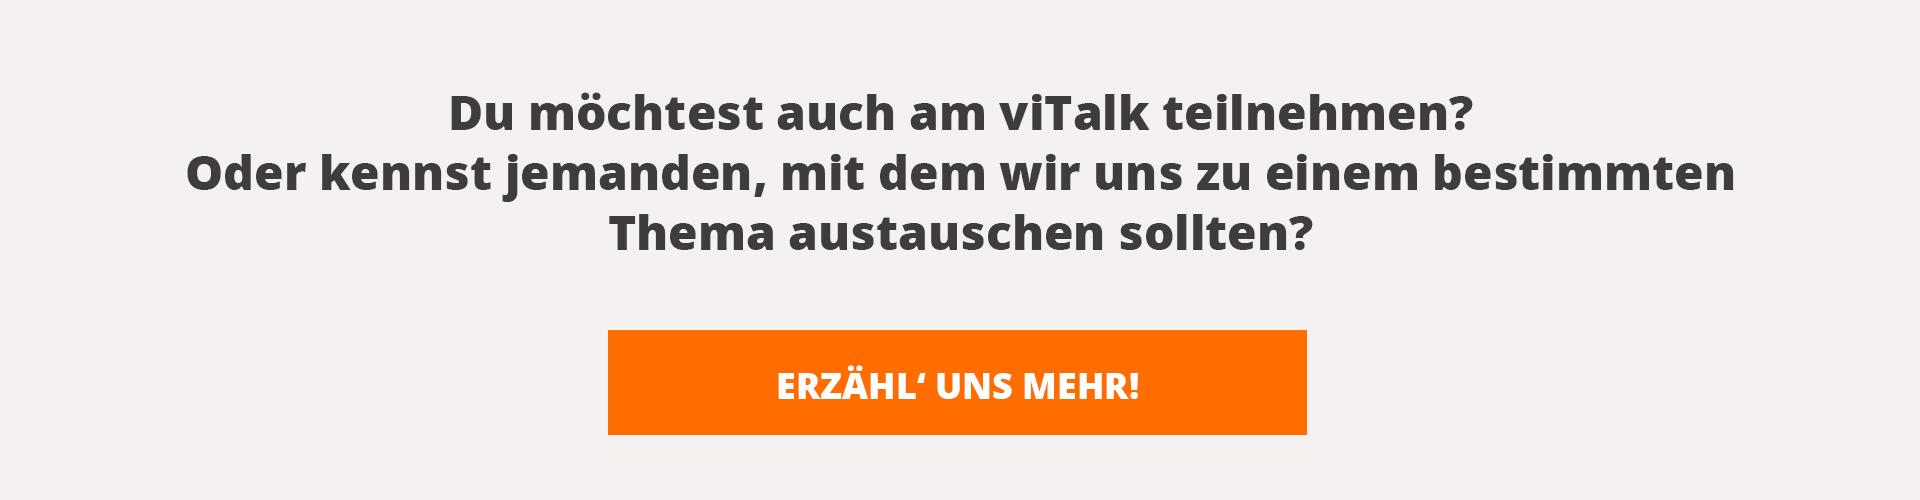 viTalk Kontakt